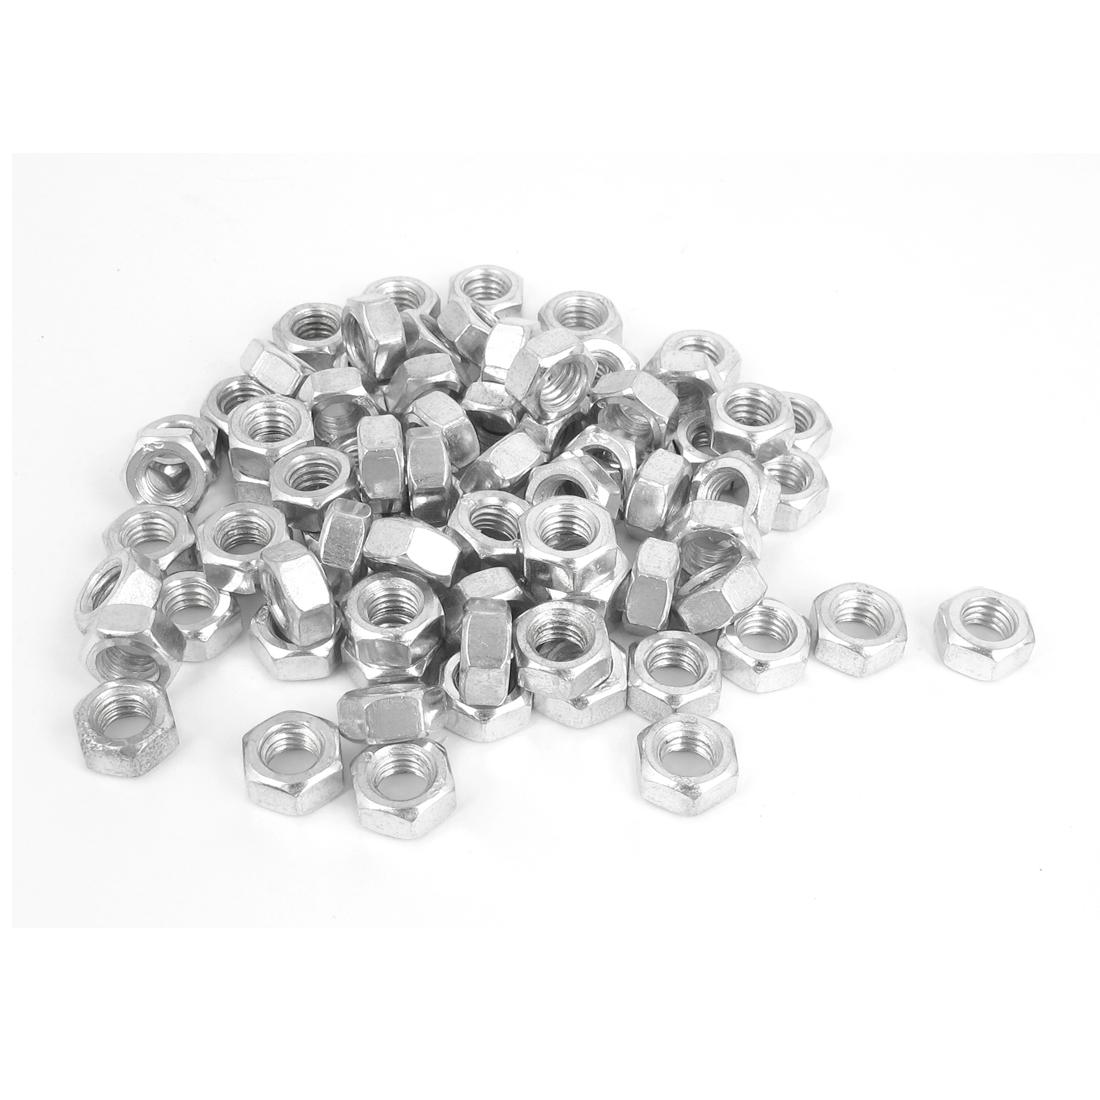 6mm Thread Dia Electric Machine Fastener Metal Screws Hex Nut Silver Tone 80Pcs